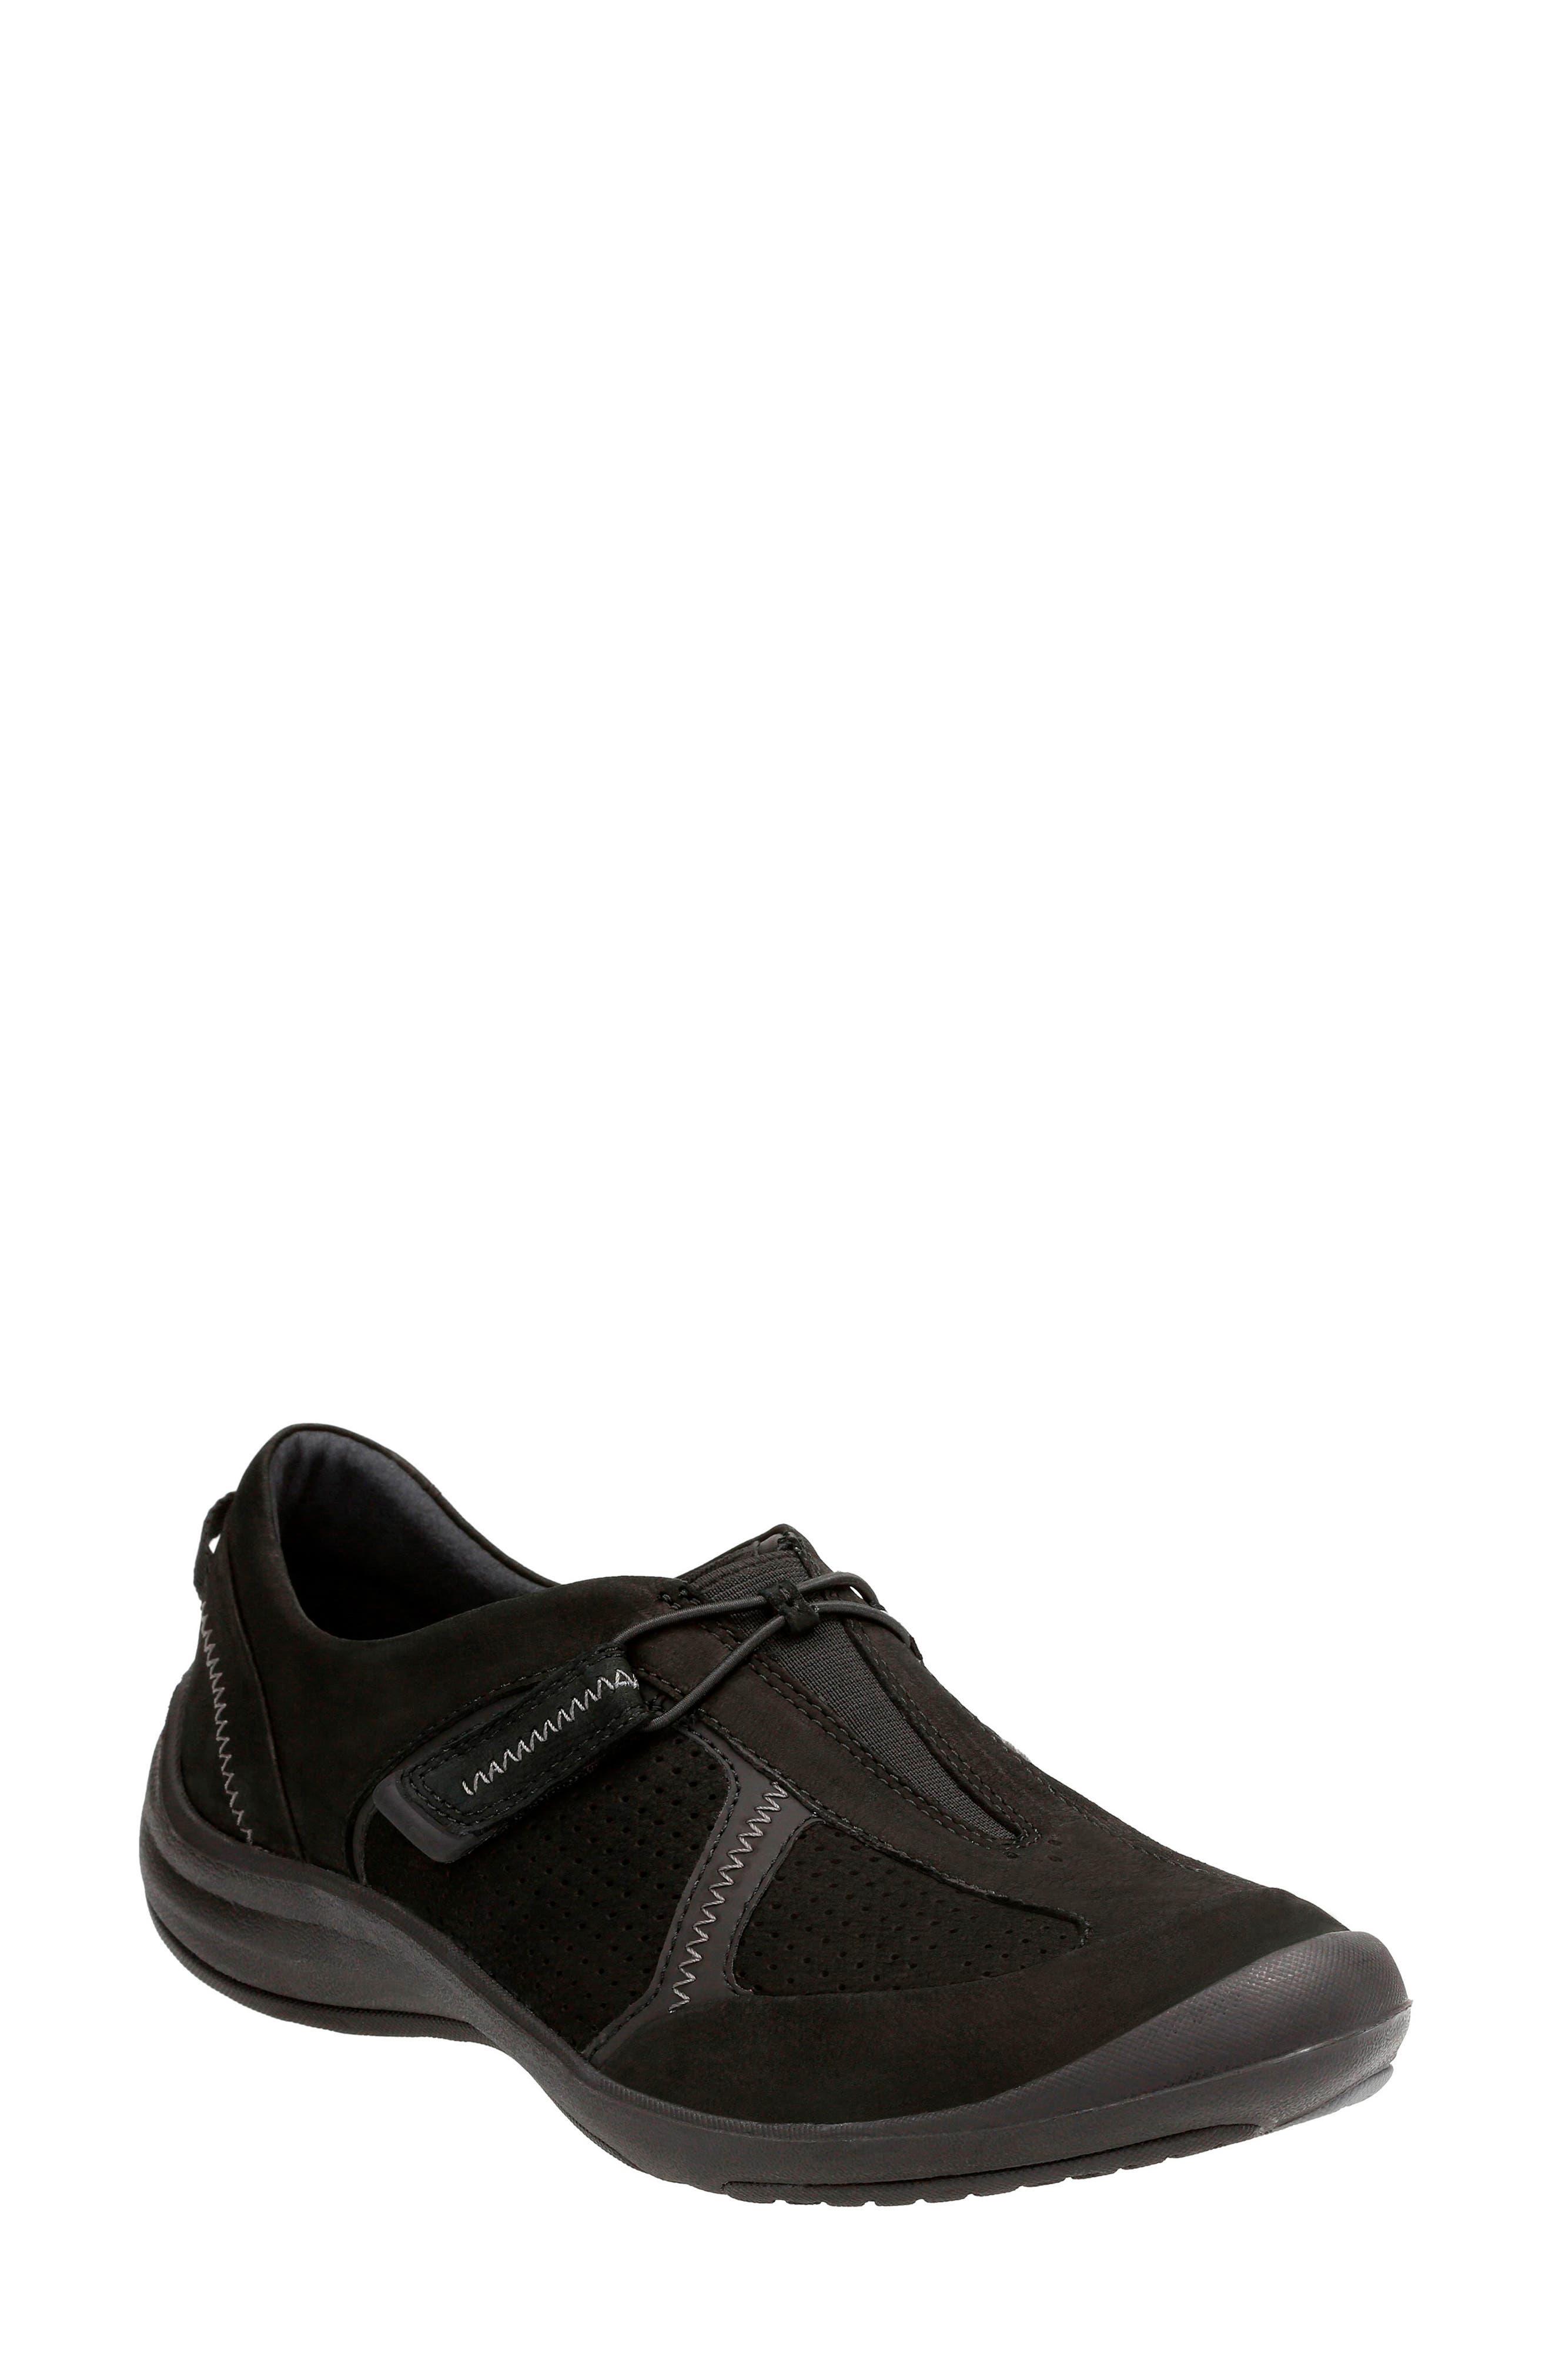 'Asney' Slip-On Sneaker,                             Main thumbnail 1, color,                             002